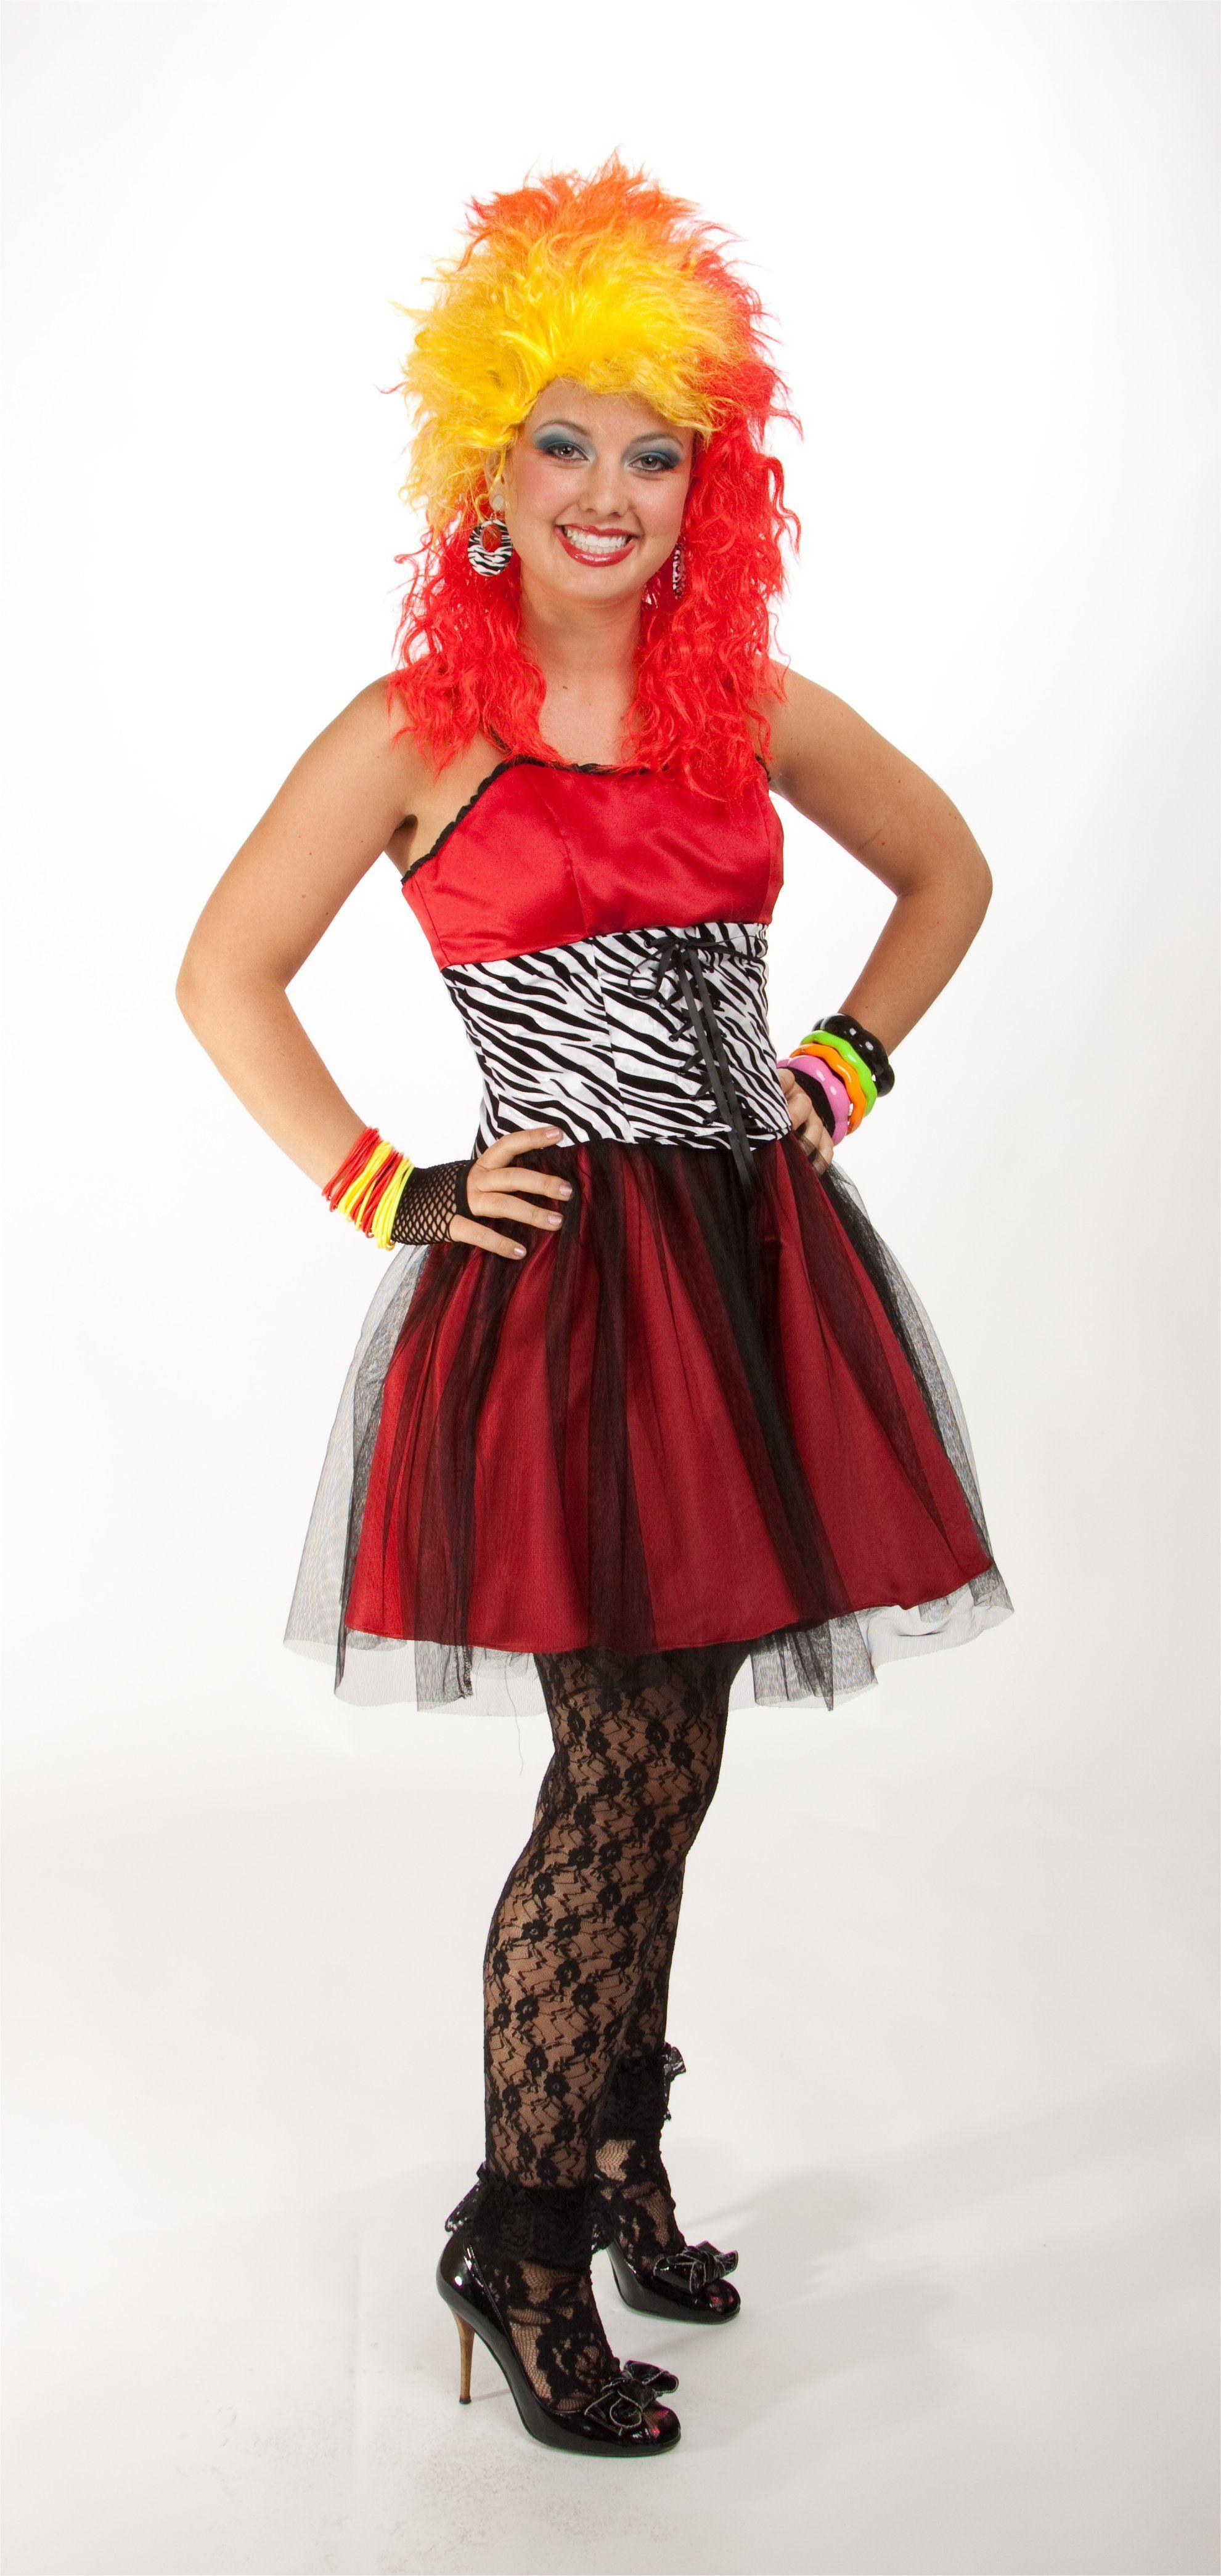 The dress halloween costume - Rocker Girl 80 S Halloween Costume Ideas 80soutfits